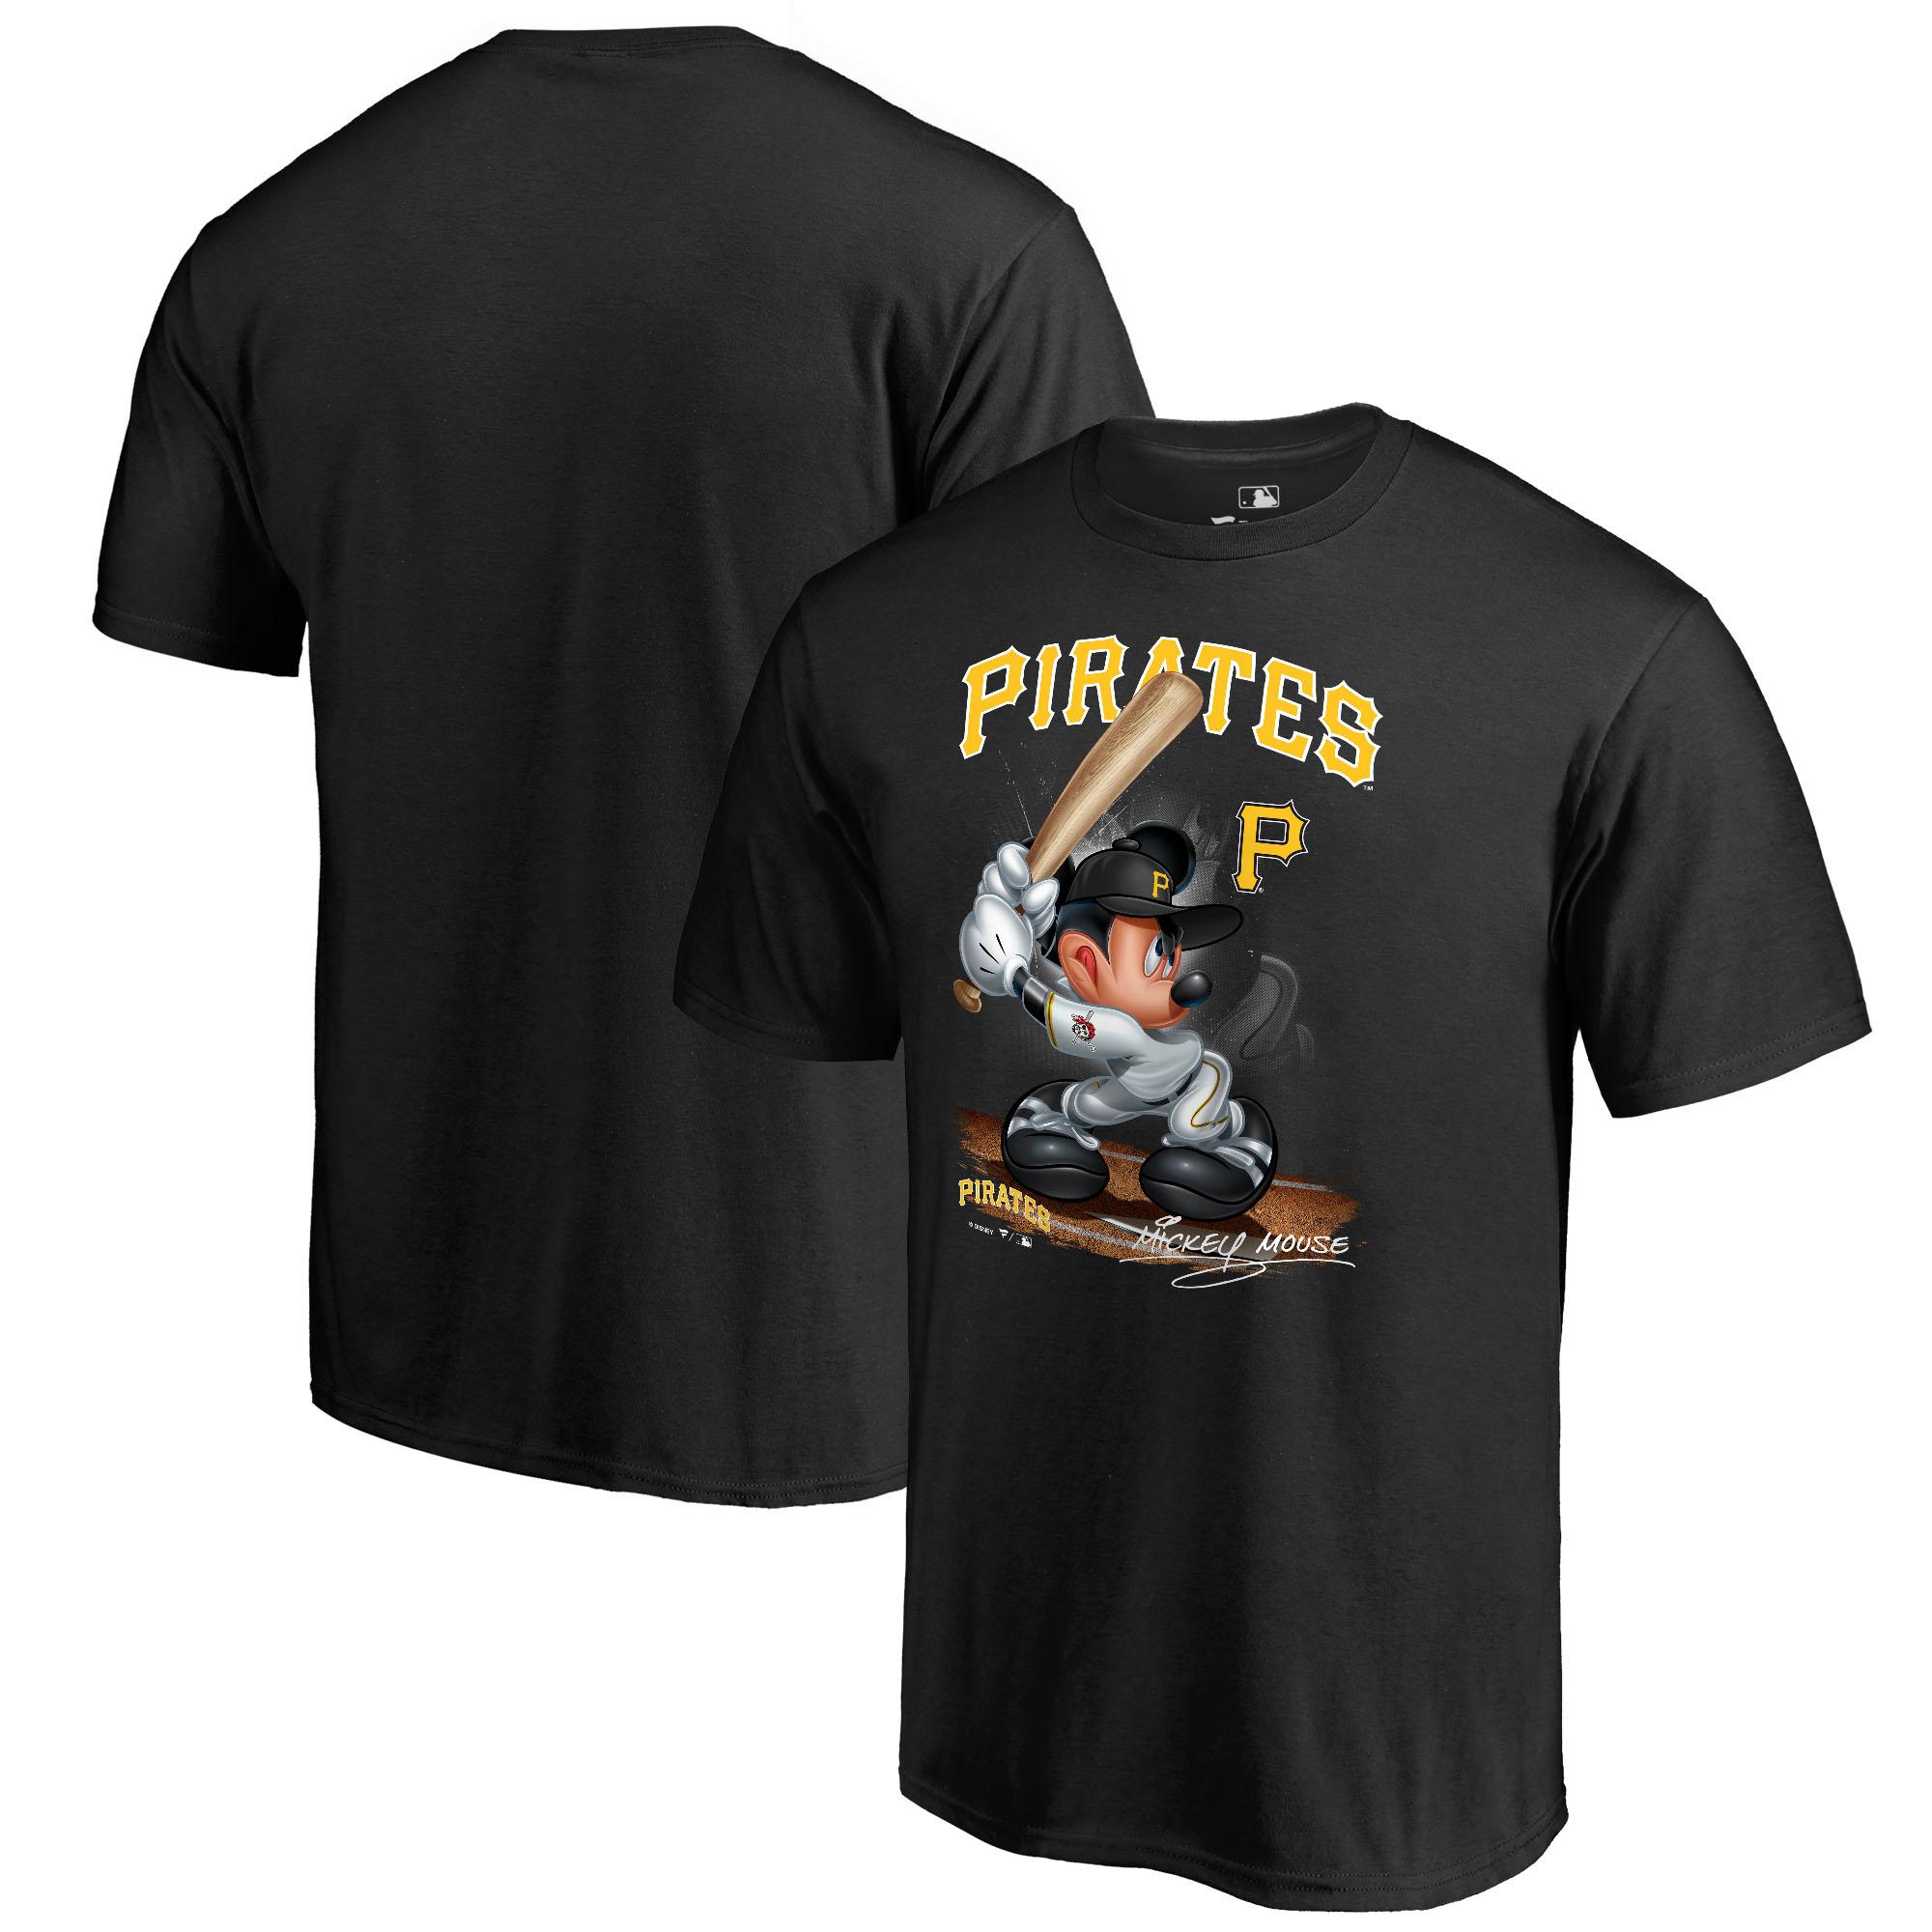 Pittsburgh Pirates Fanatics Branded Youth Disney All Star T-Shirt - Black